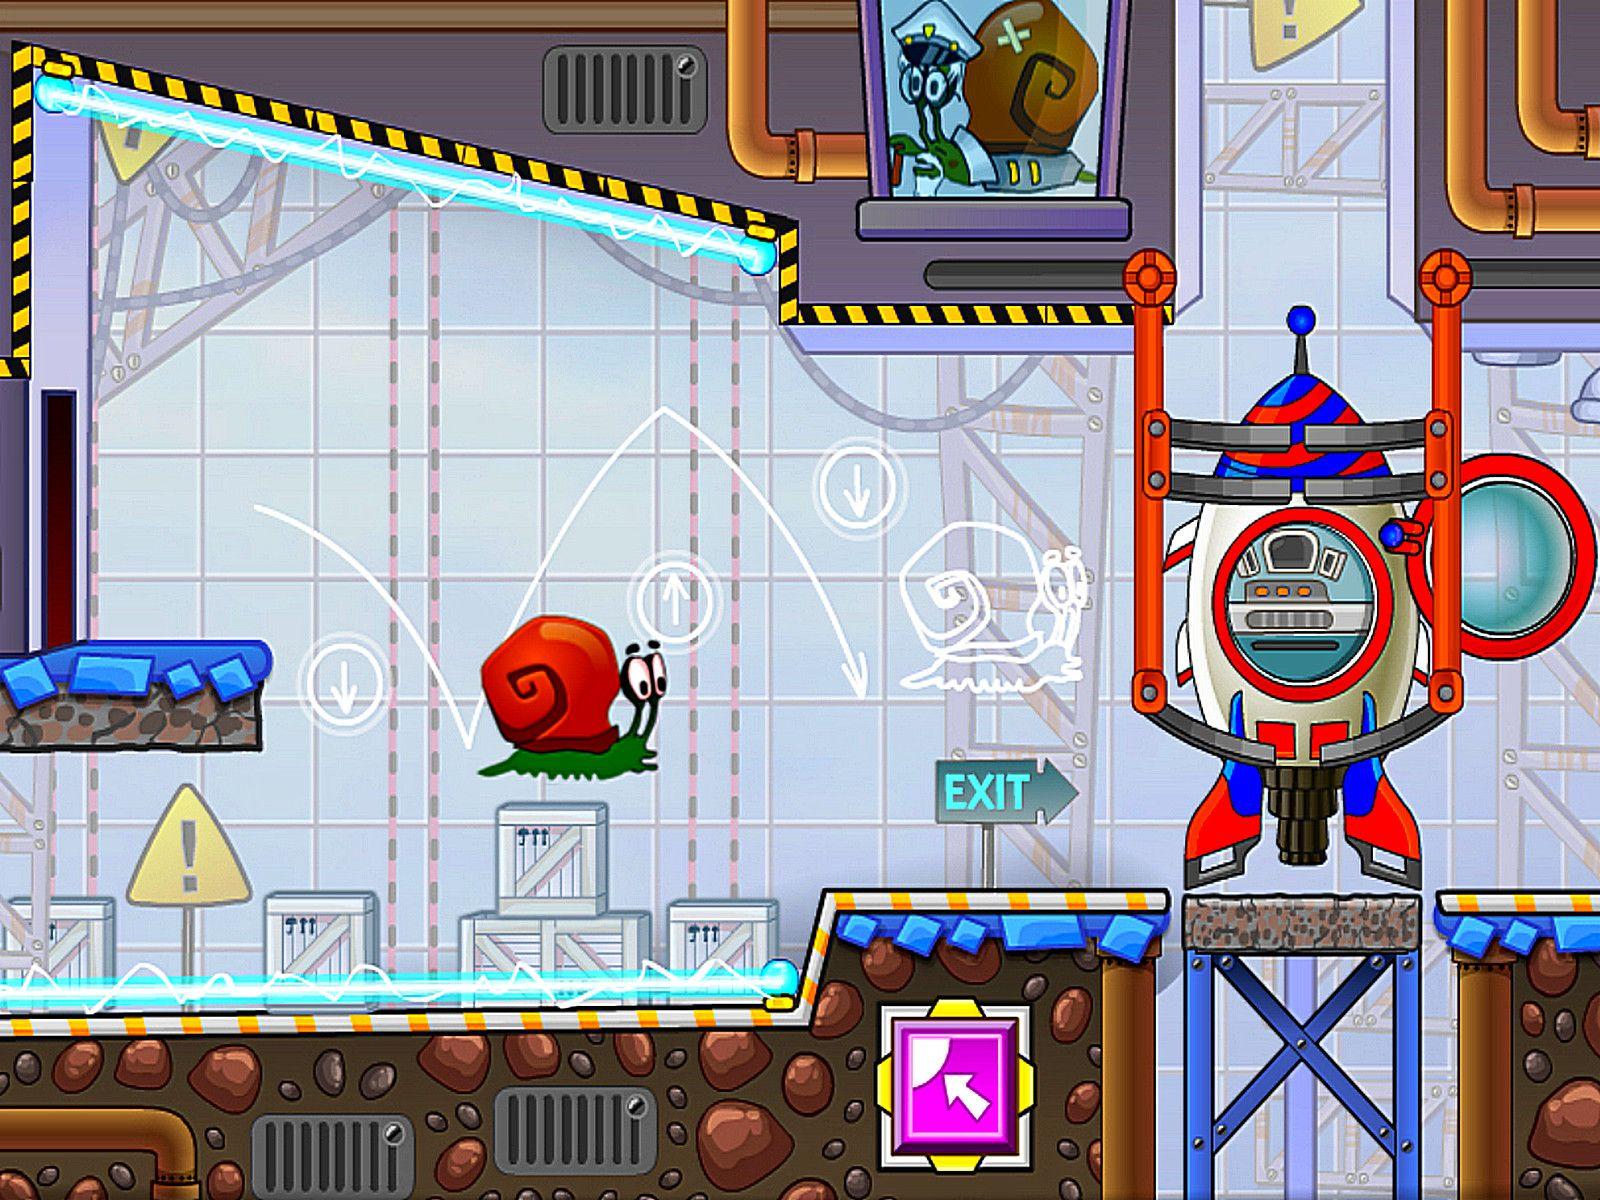 Snail Bob 4 Space Space games, Platform game, Plus games